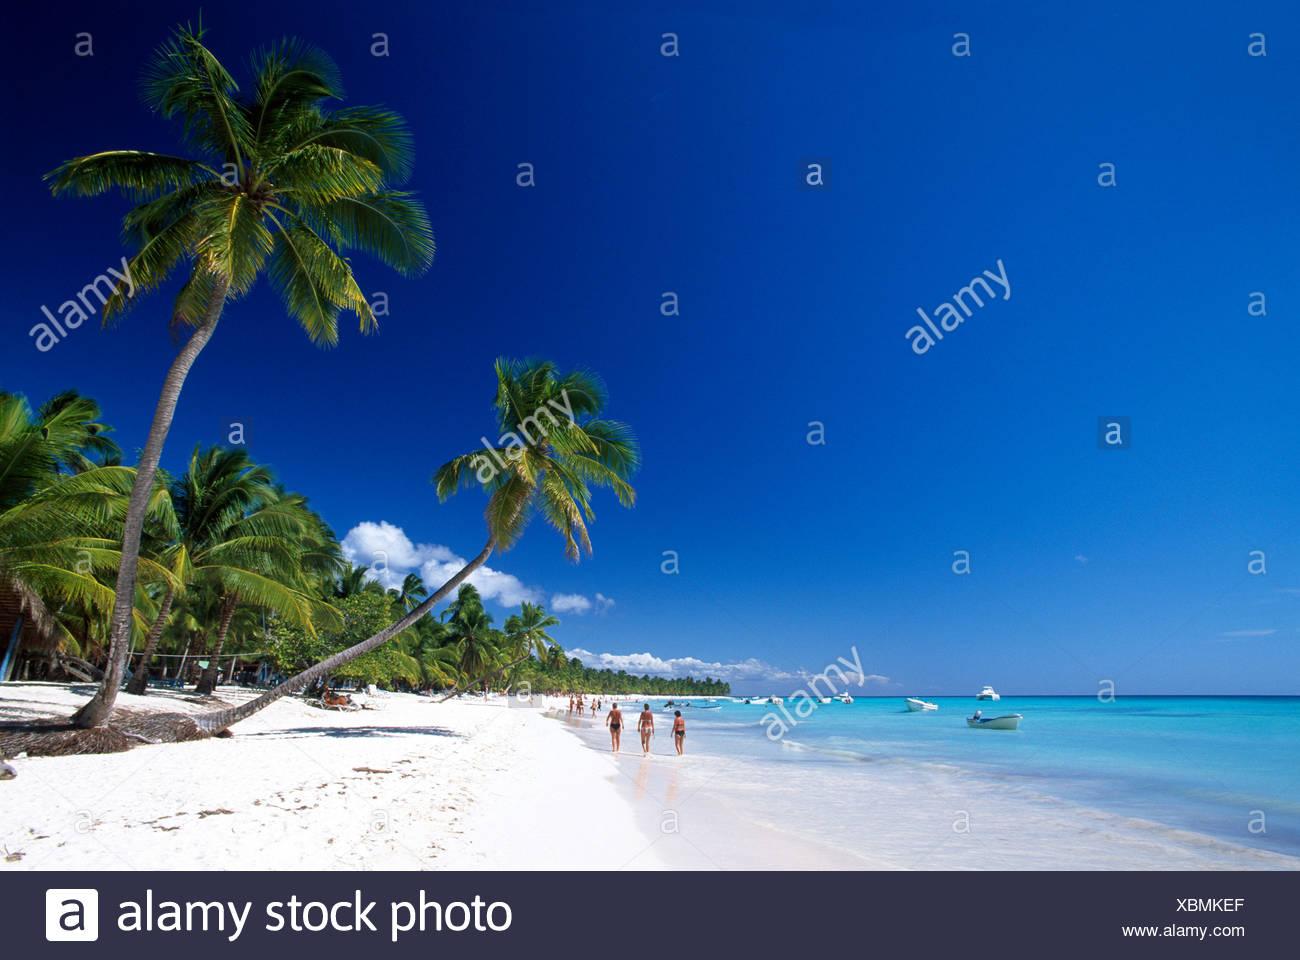 Fuera, la Catedral Dome, Rep, la República Dominicana, al aire libre, fuera de la isla, Isla Saona, Isla Saona, el Caribe, Caribe Imagen De Stock